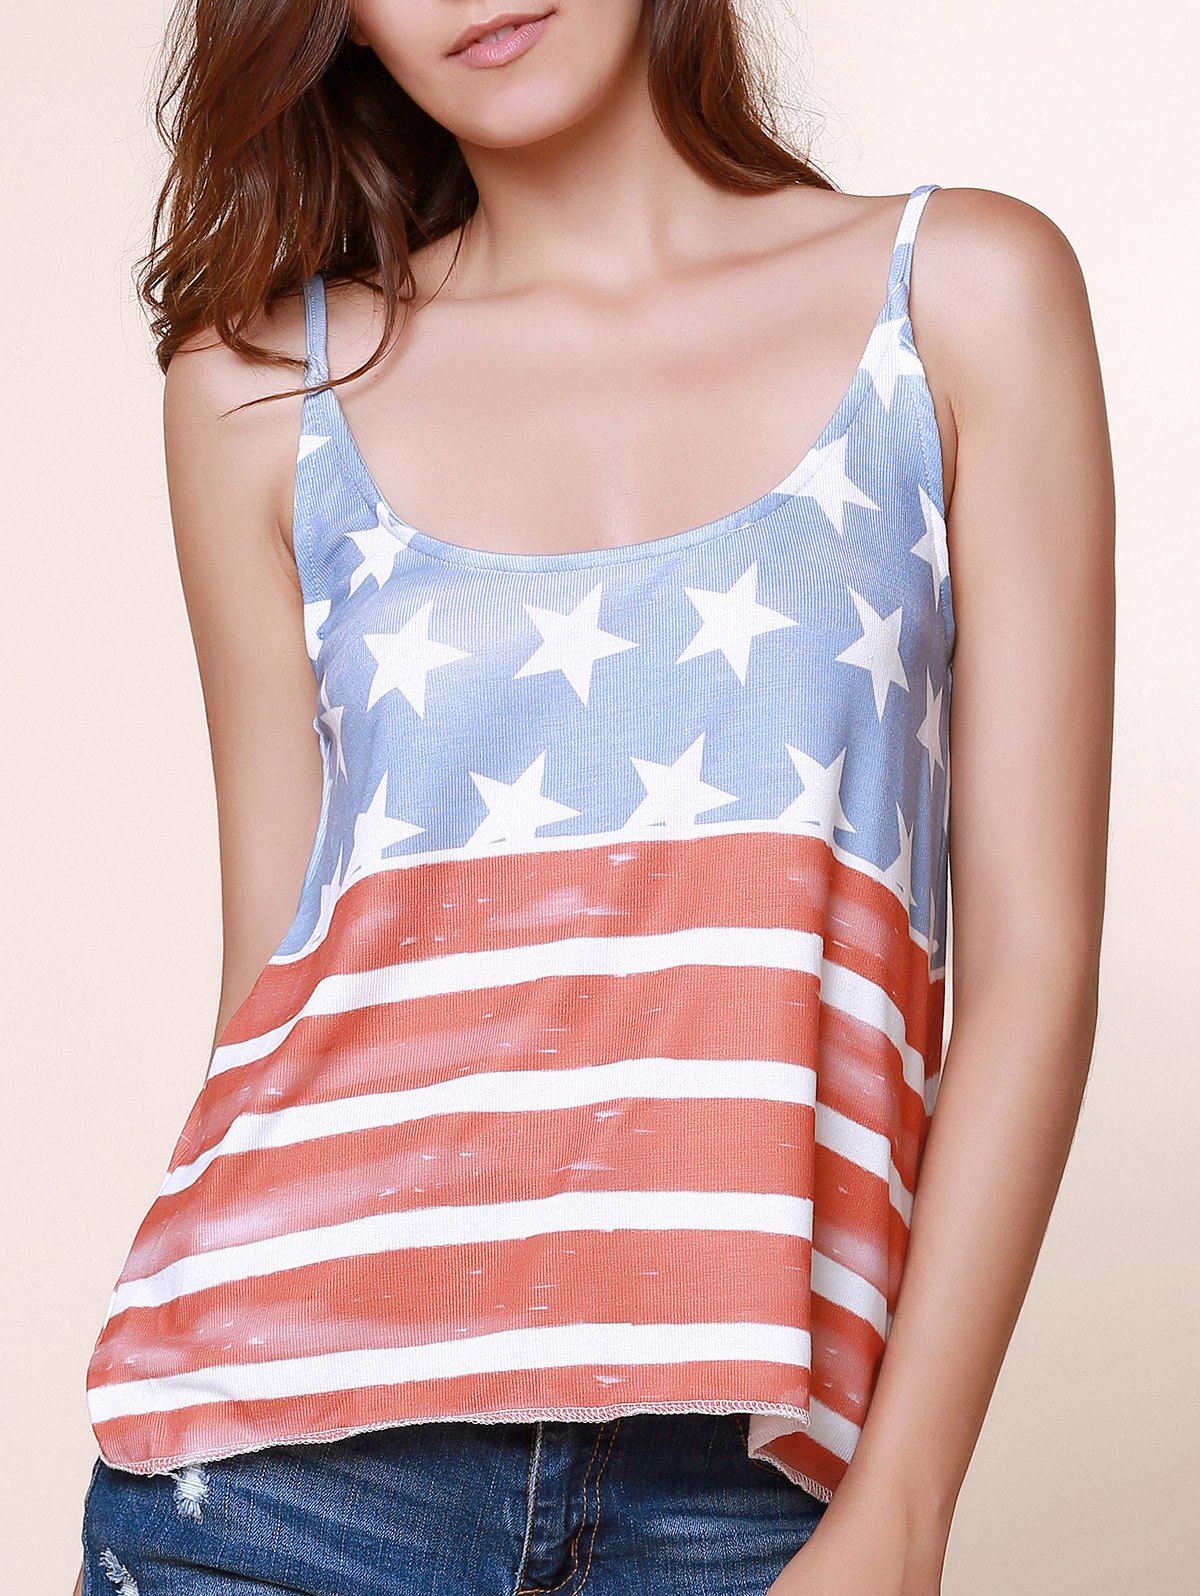 Bretelles spaghetti drapeau américain Tops